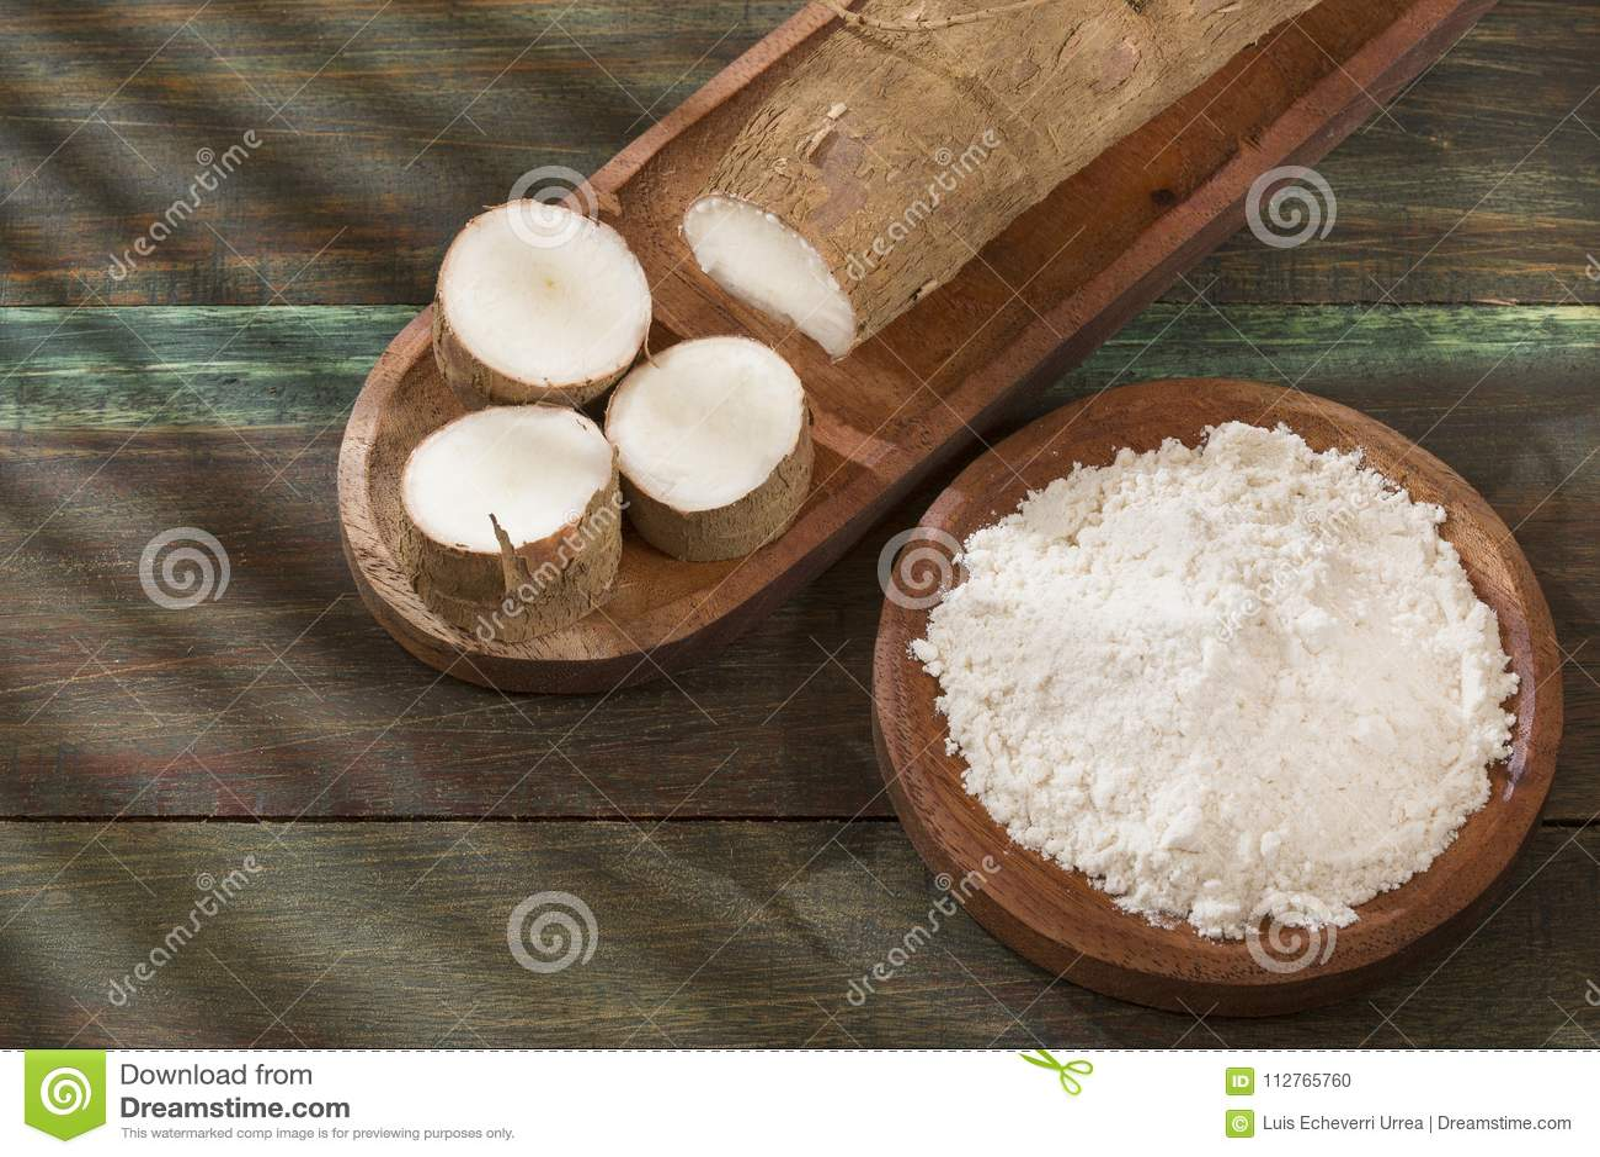 Amidon de manioc - Manihot esculenta